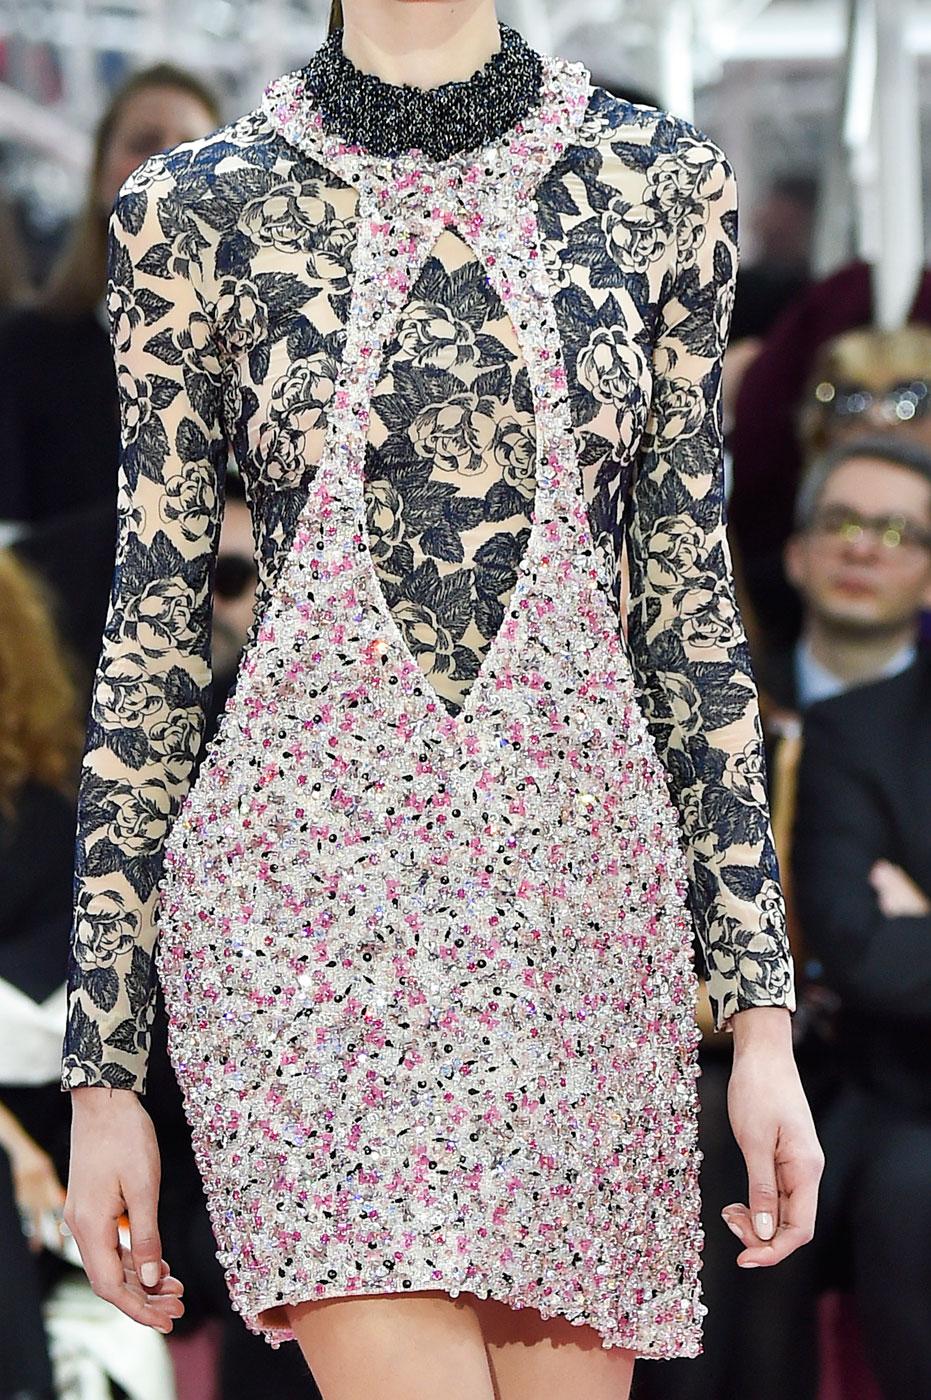 Christian-Dior-fashion-runway-show-close-ups-haute-couture-paris-spring-summer-2015-the-impression-080